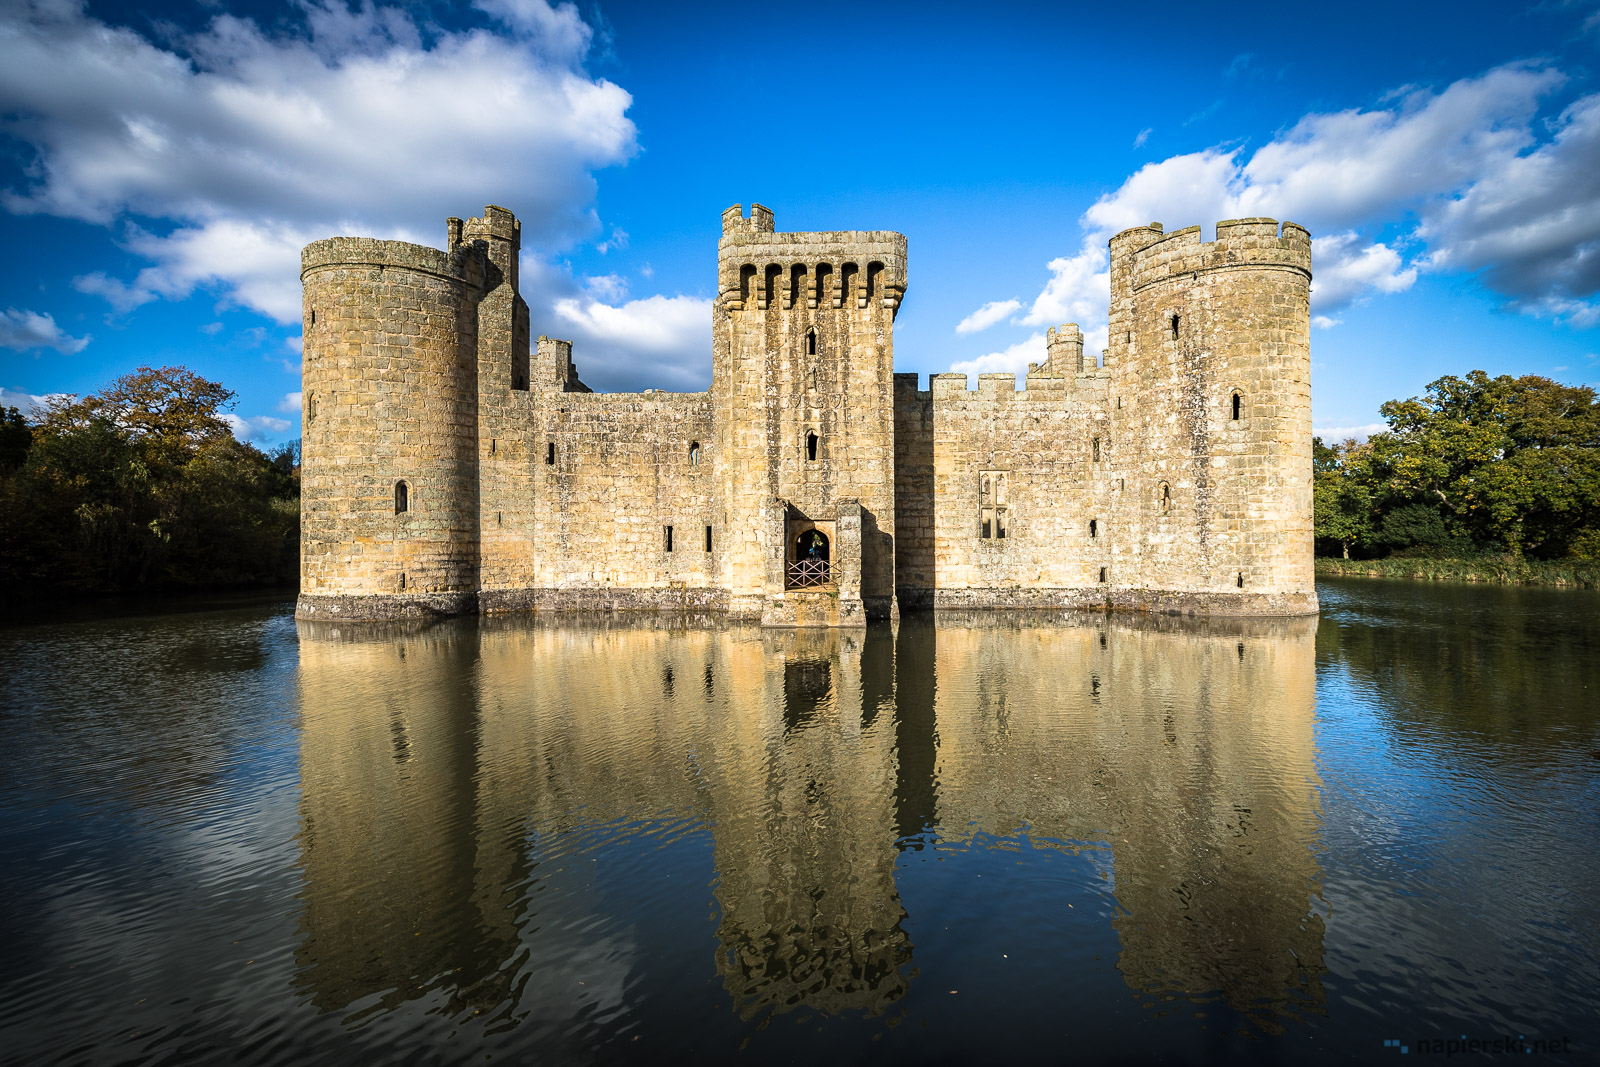 October 2017, Bodiam Castle, Robertsbridge, East Sussex, England, UK